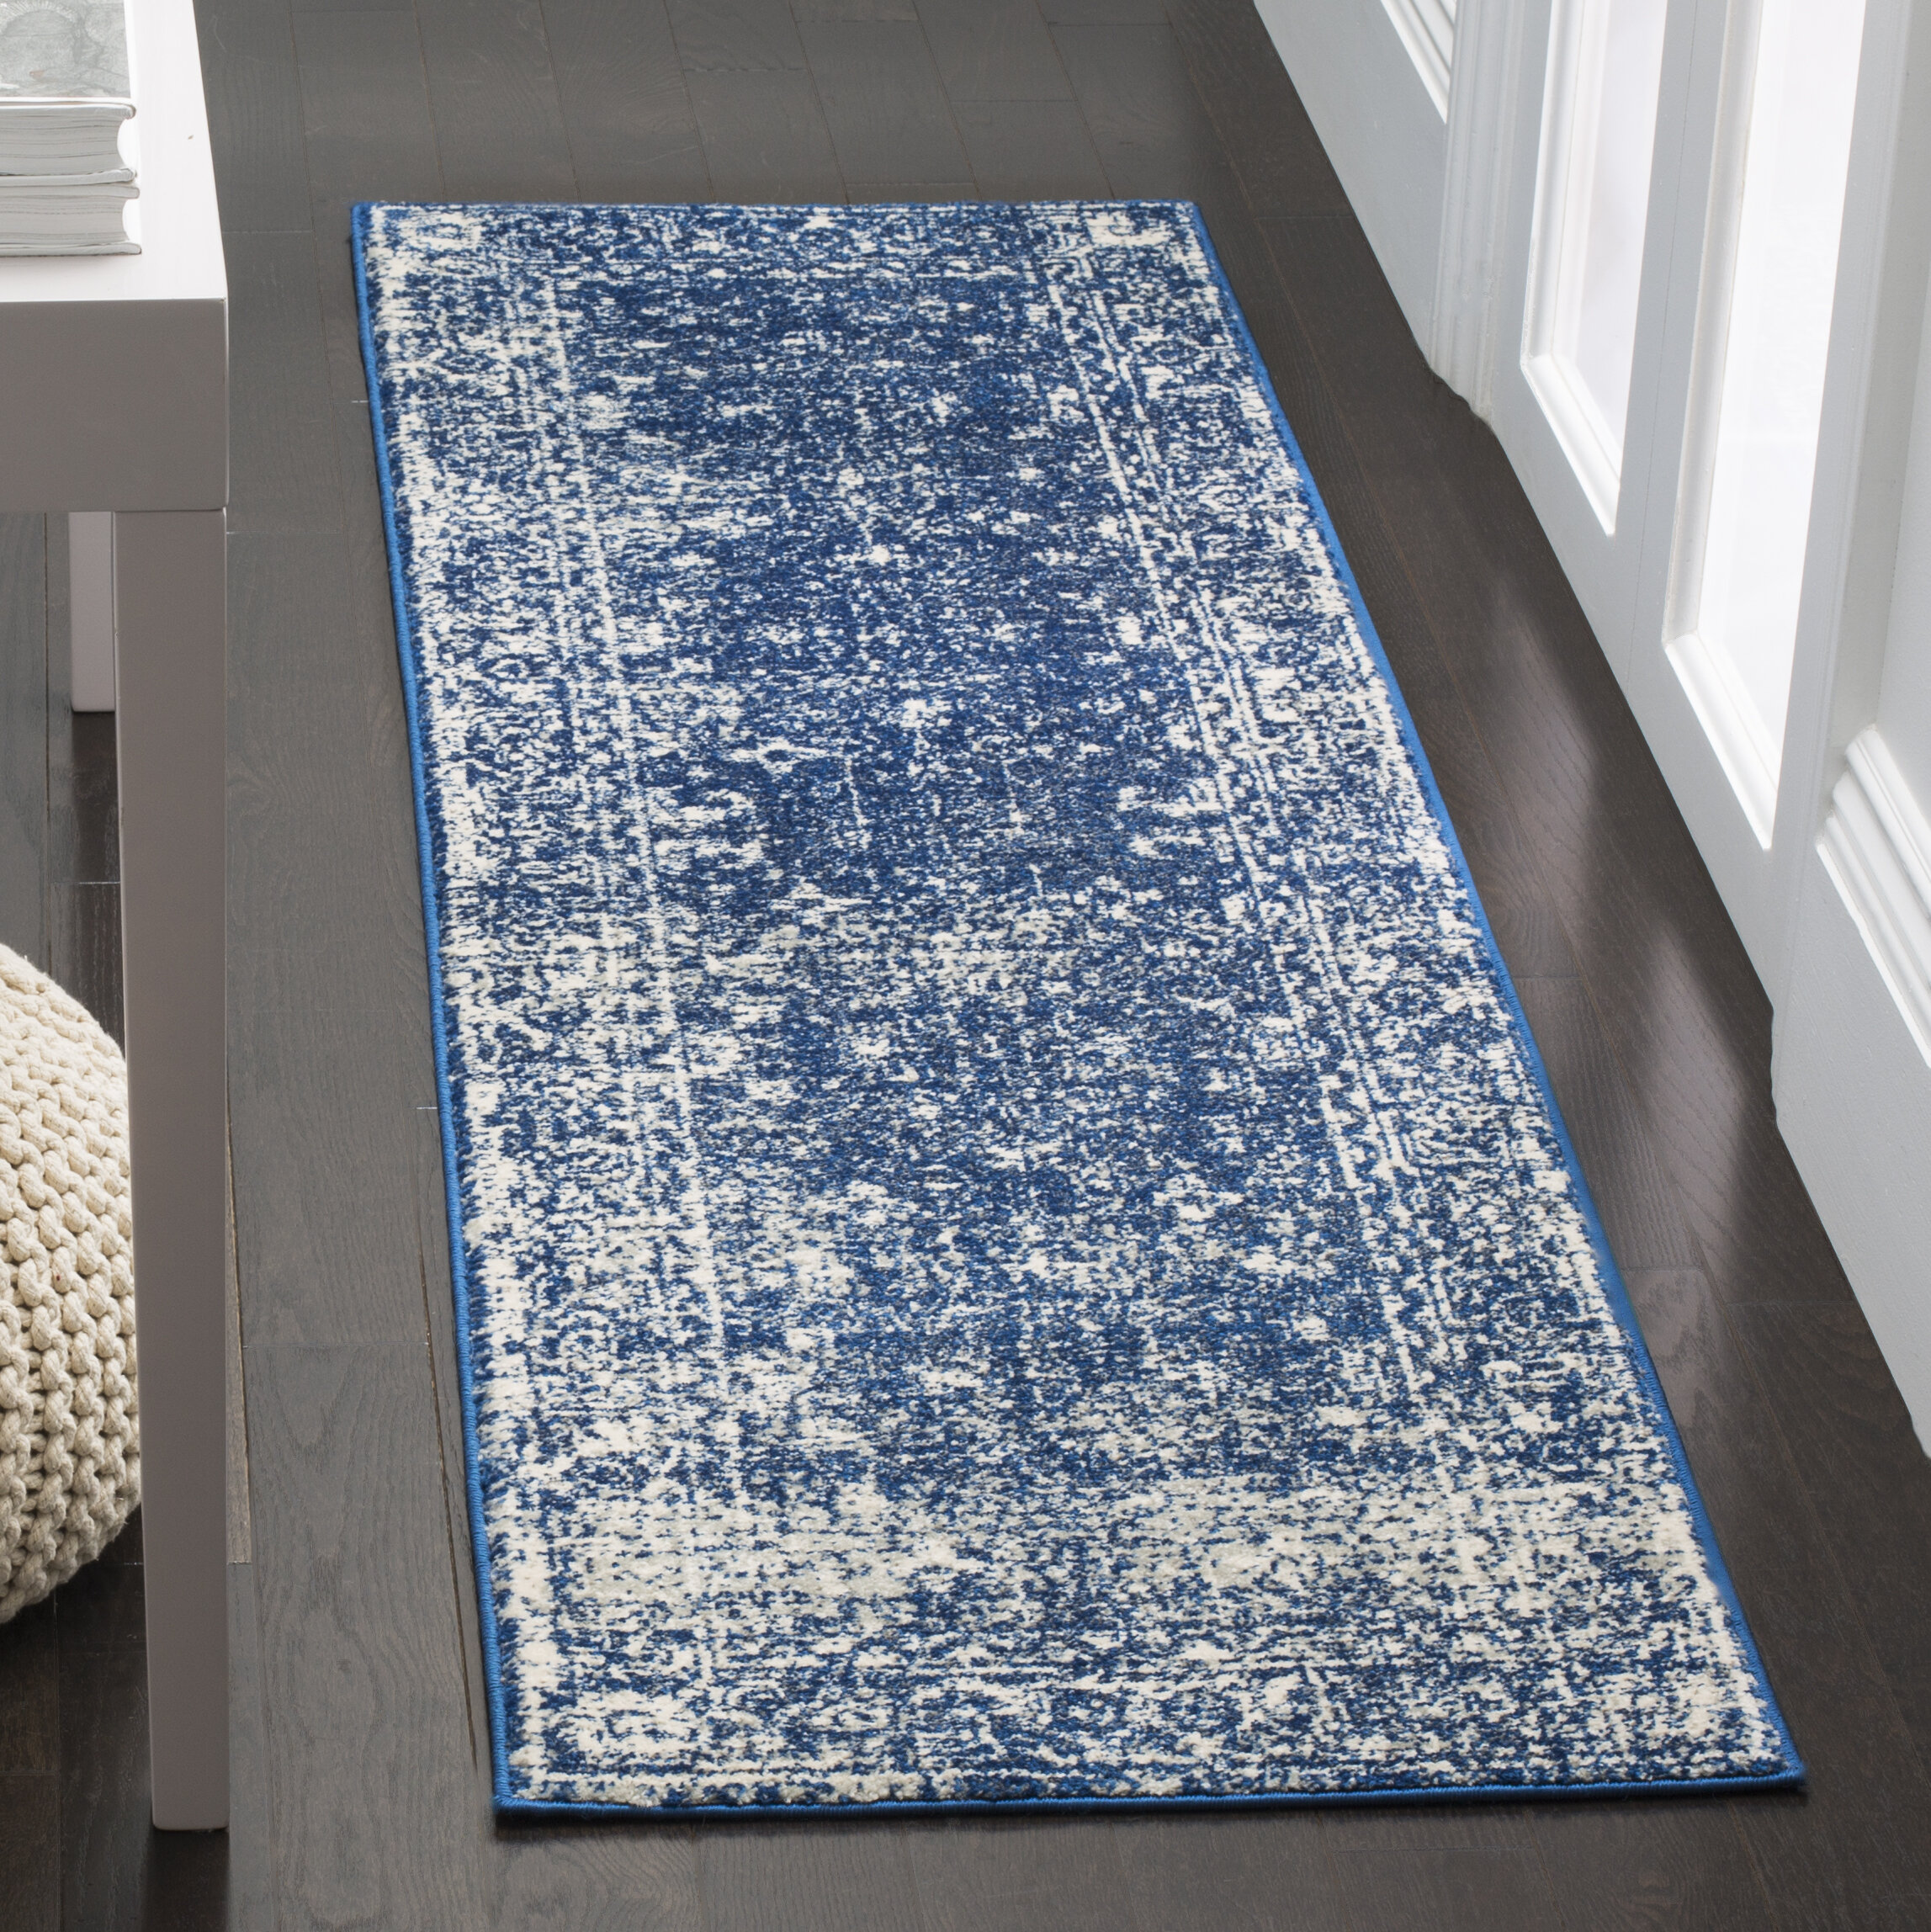 Ophelia & Co. Esperance Blue/Beige Area Rug